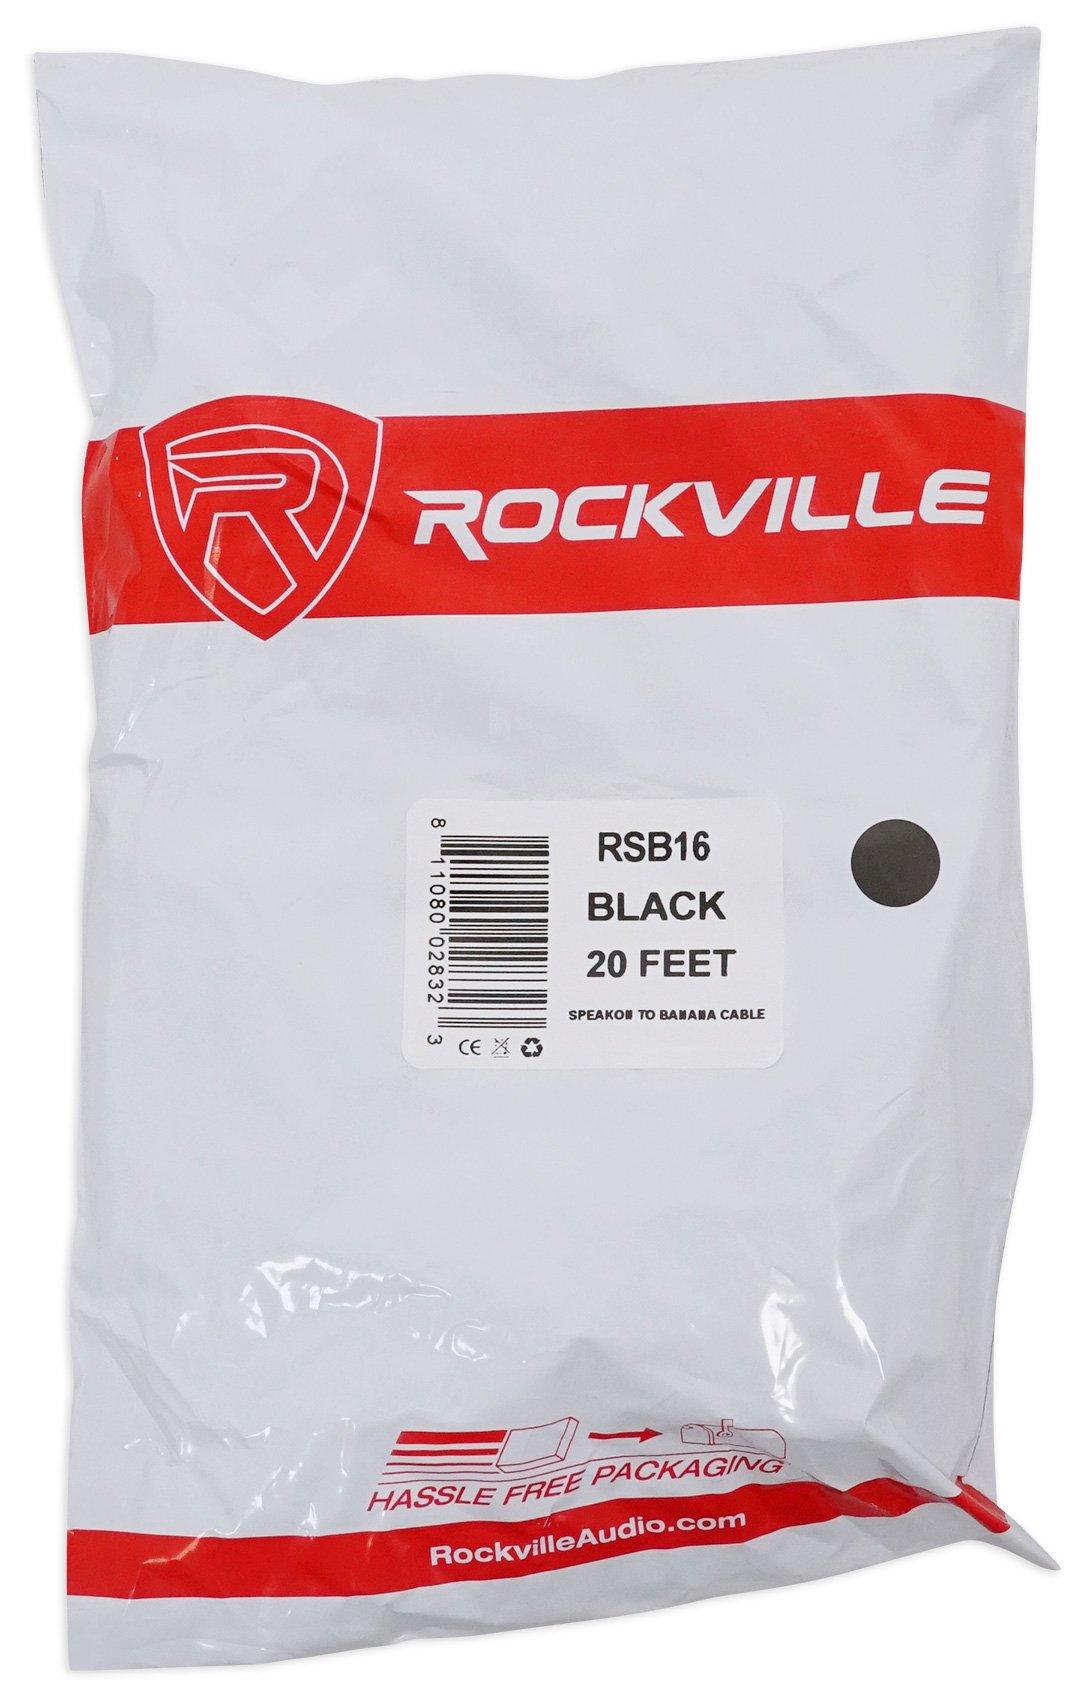 Rockville 20 Foot Speakon to Banana Speaker Cable, 16 Gauge, 100% Copper! (RSB16) by Rockville (Image #6)